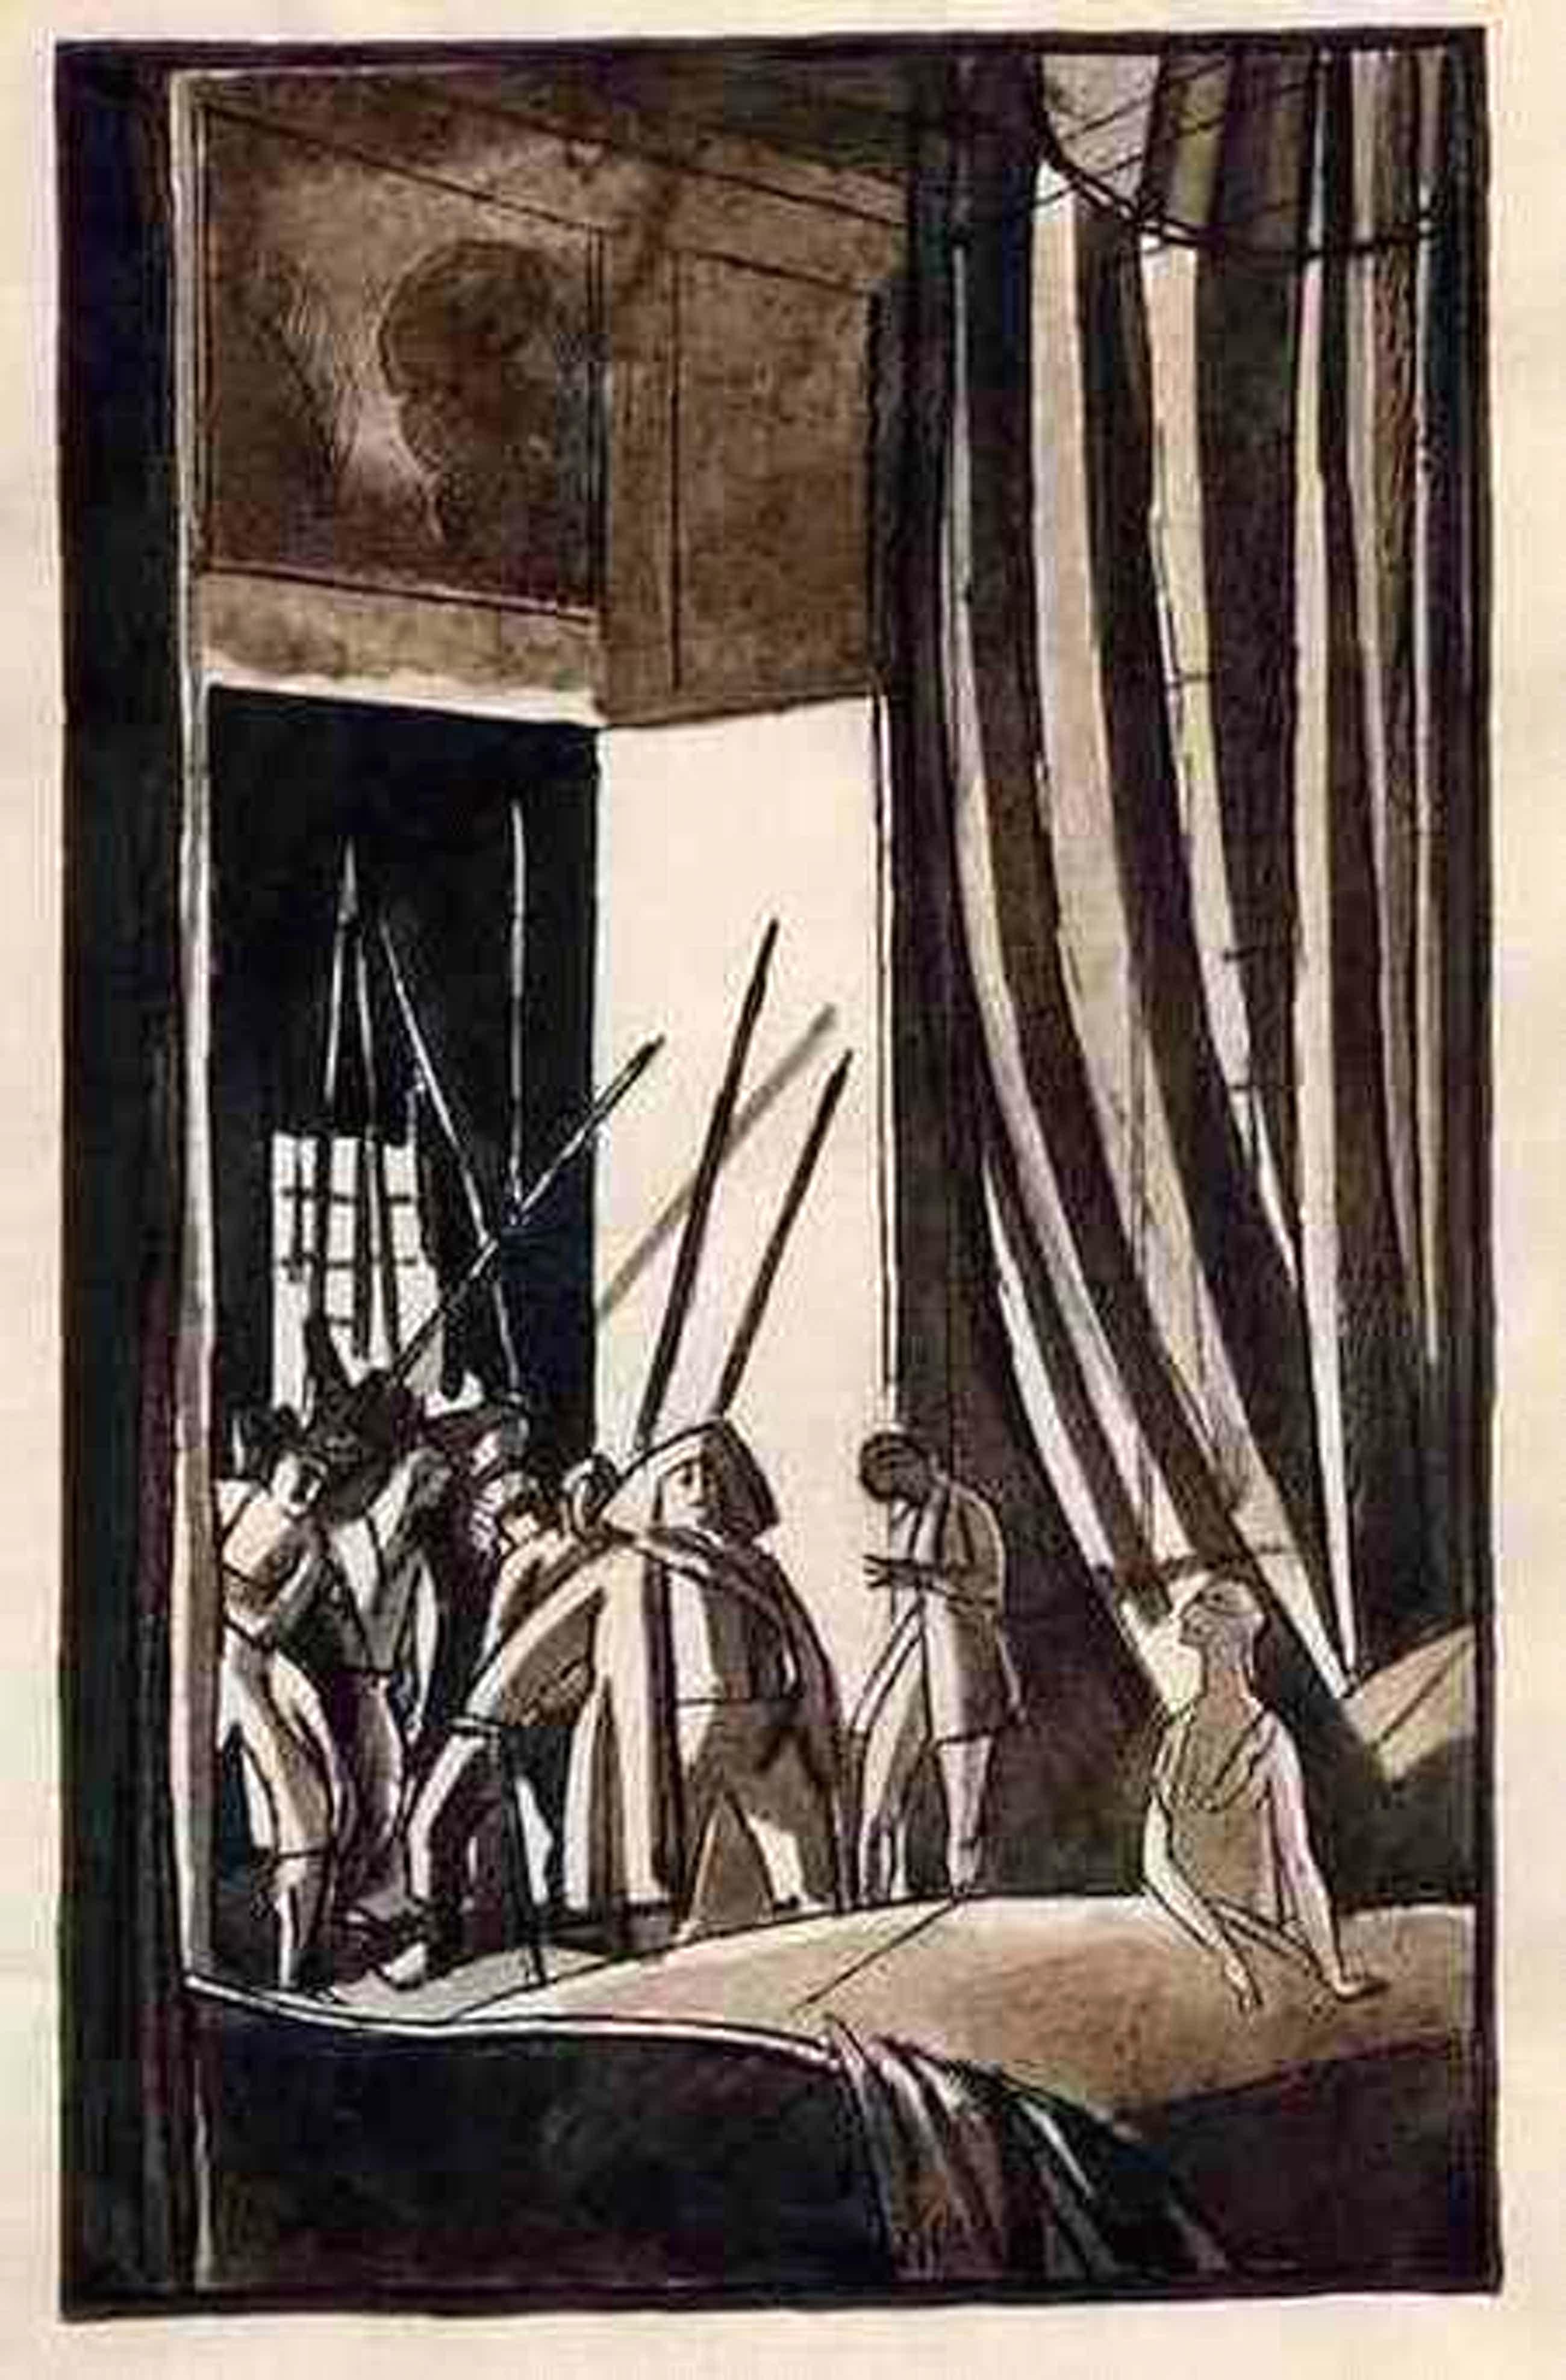 Edouard Lèon  Louis Legrand - Wenn die REVOLUTION an die TÜR KLOPFT - Original Feder-AquarellZeichnung 1921 handsigniert PLUME/AQU kopen? Bied vanaf 285!